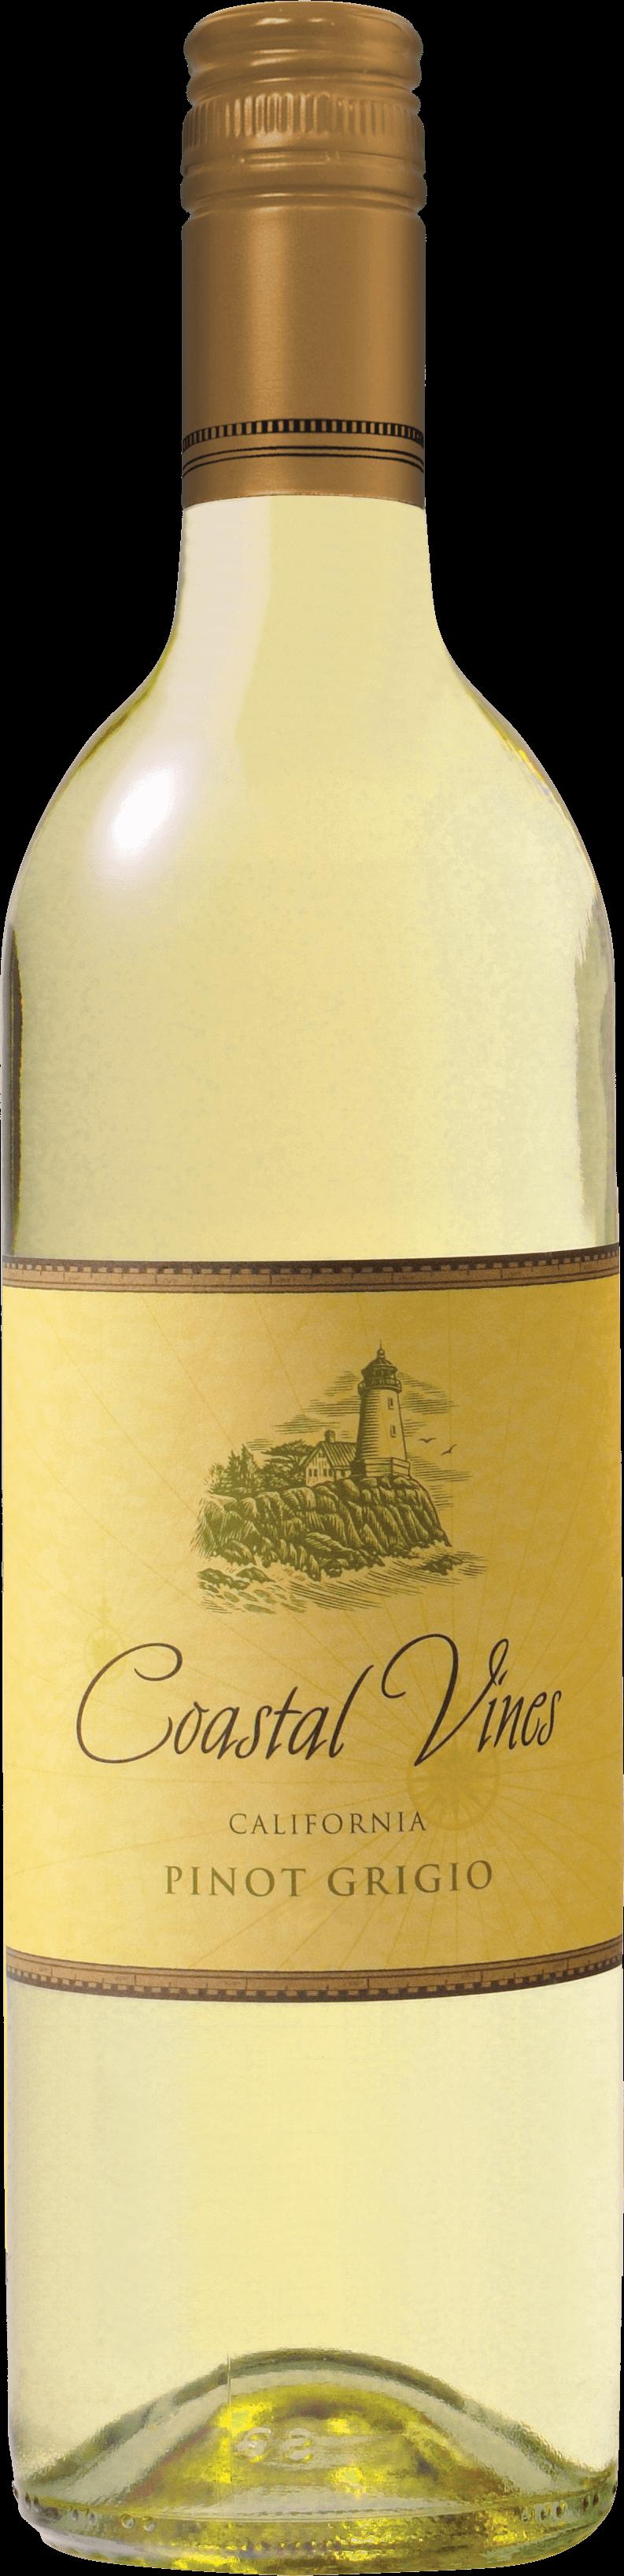 Coastal Vines Pinot Grigio Bottleshot